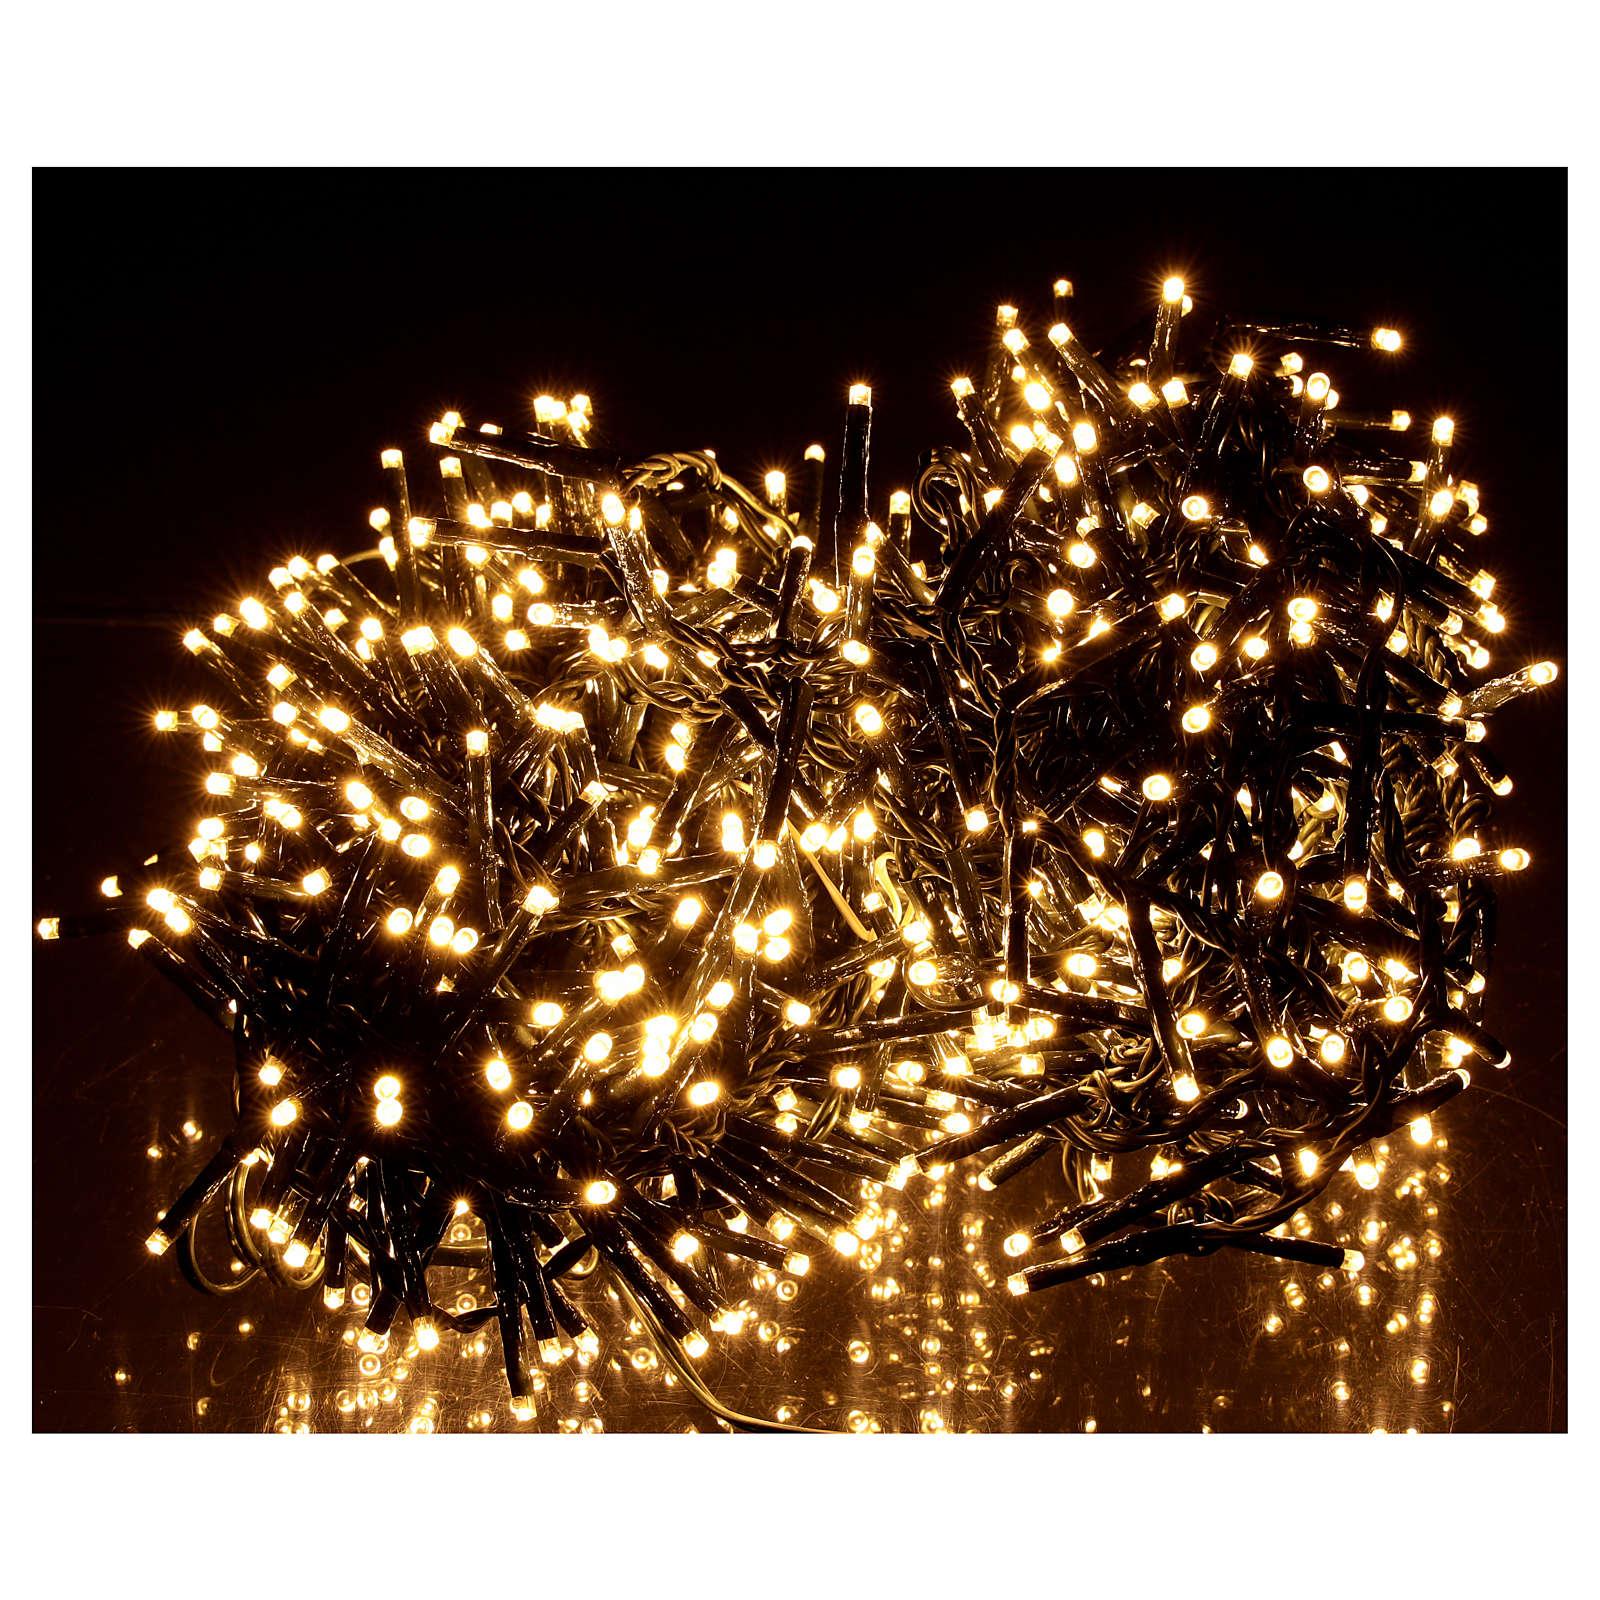 Cadena luminosa navideña verde 750 led blanco cálido para exterior 3